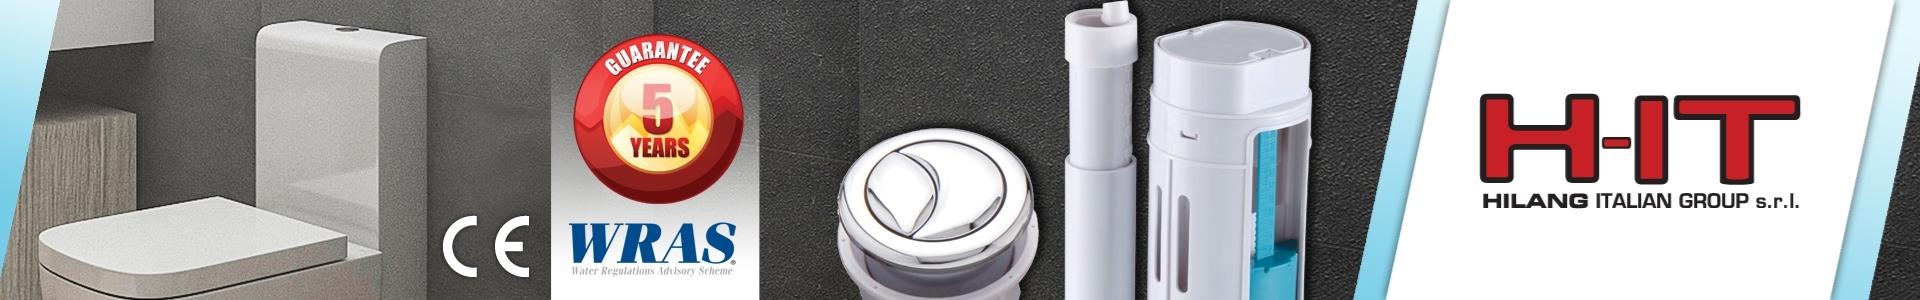 Picture of H-IT Flush Valves